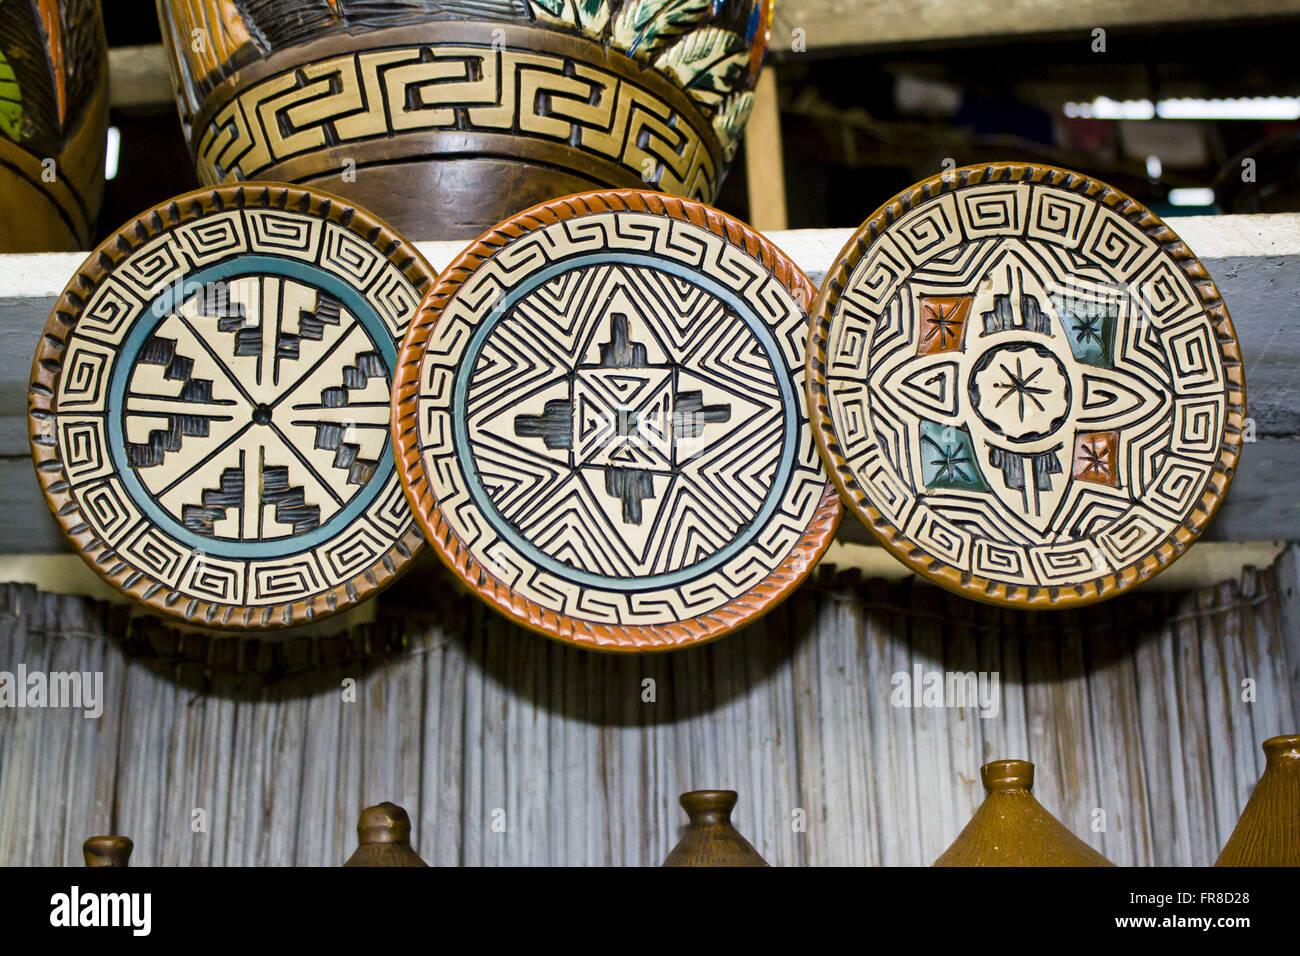 Ceramica marajoara - typical of the Amazon region - Stock Image